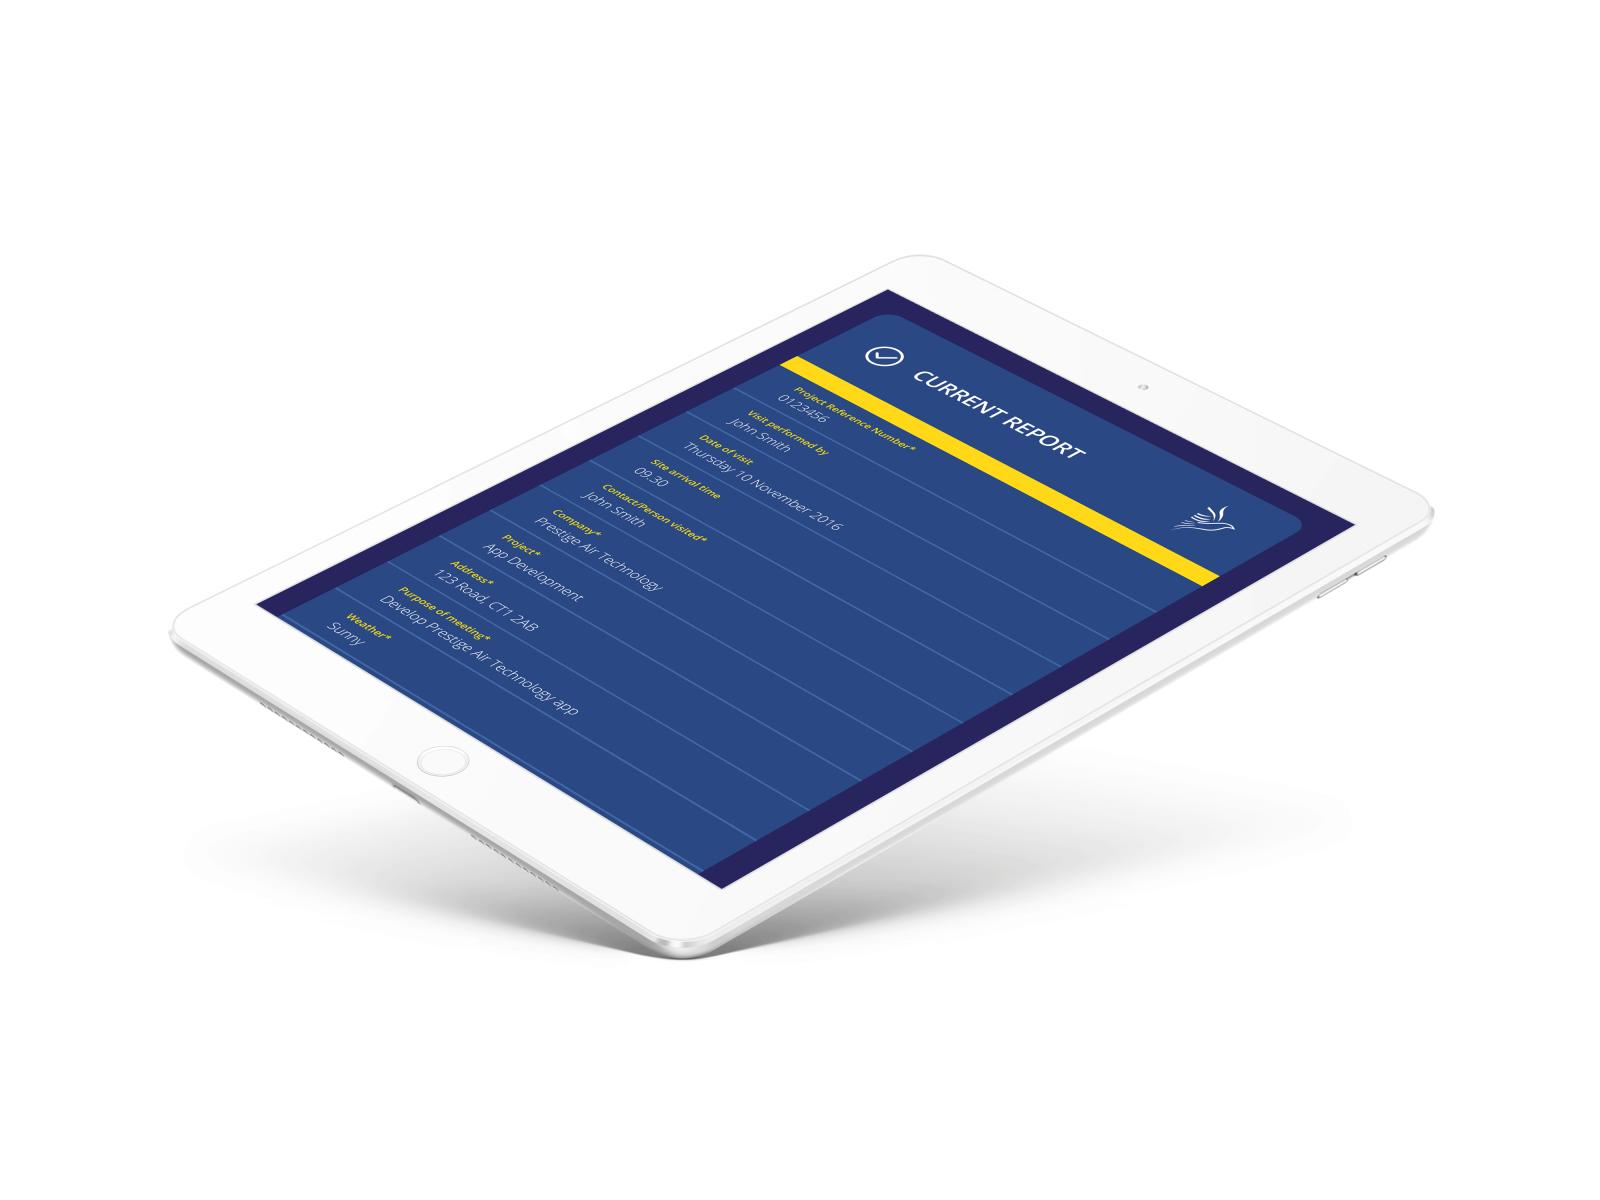 App-Prestige-app-ui-design-agency-graphic-design-canterbury-02.png